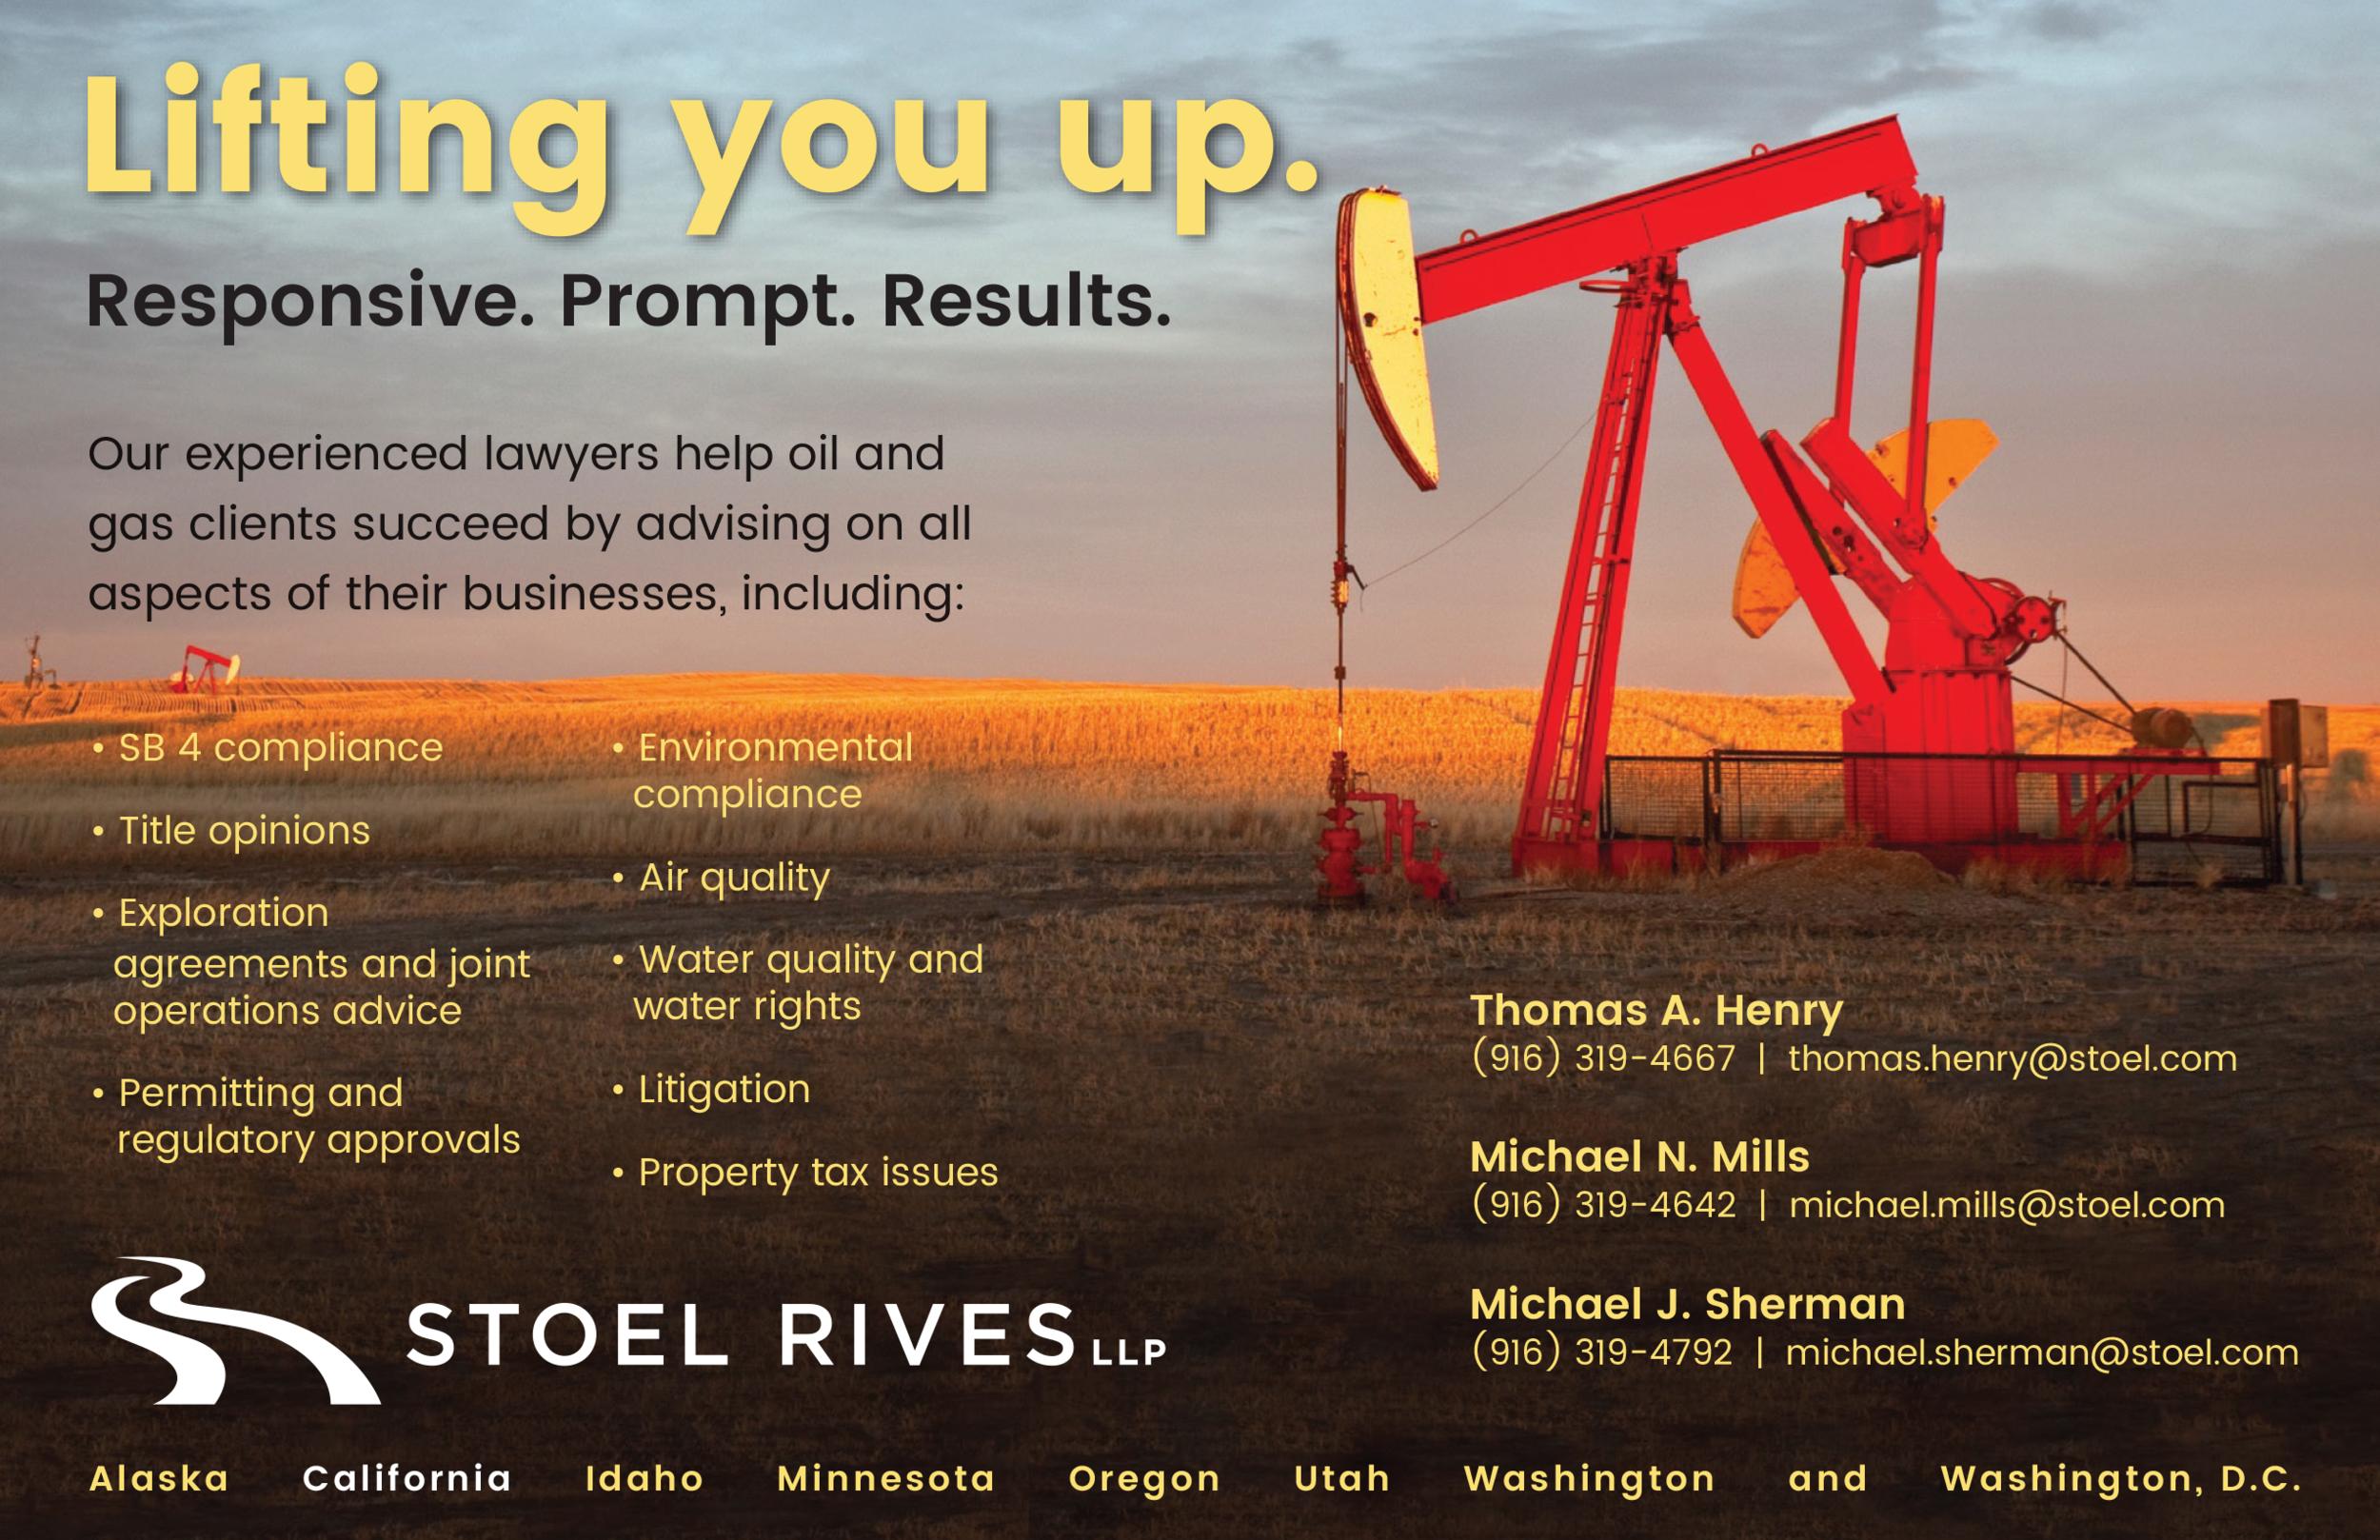 Stoel Rives New Ad (11-17-2016).png